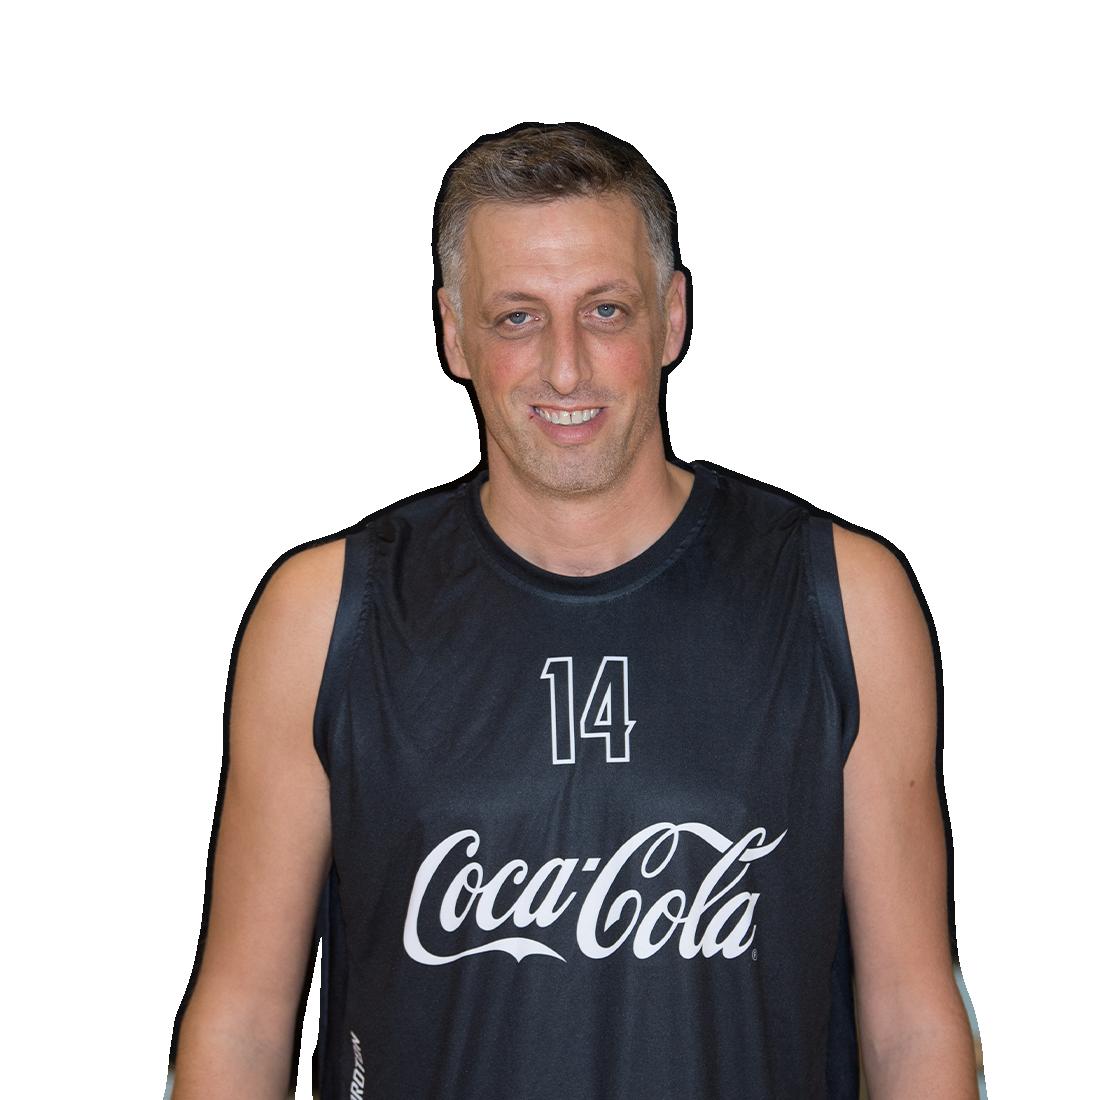 Dimitris Zacharopoulos